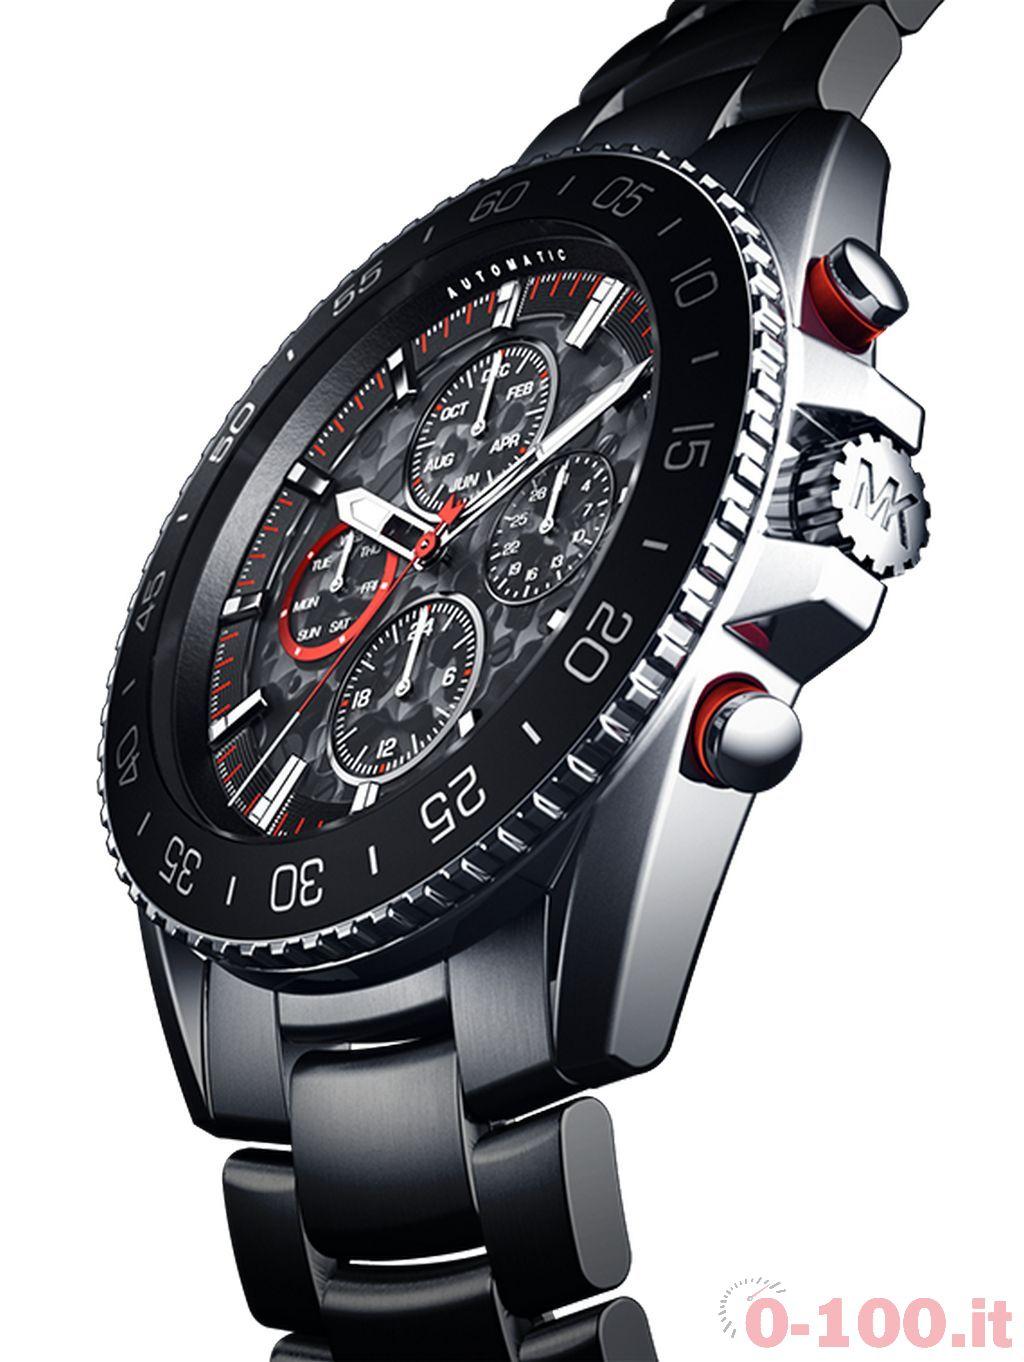 michael-kors-jetmaster-automatic-watch-prezzo-price-0-100_5